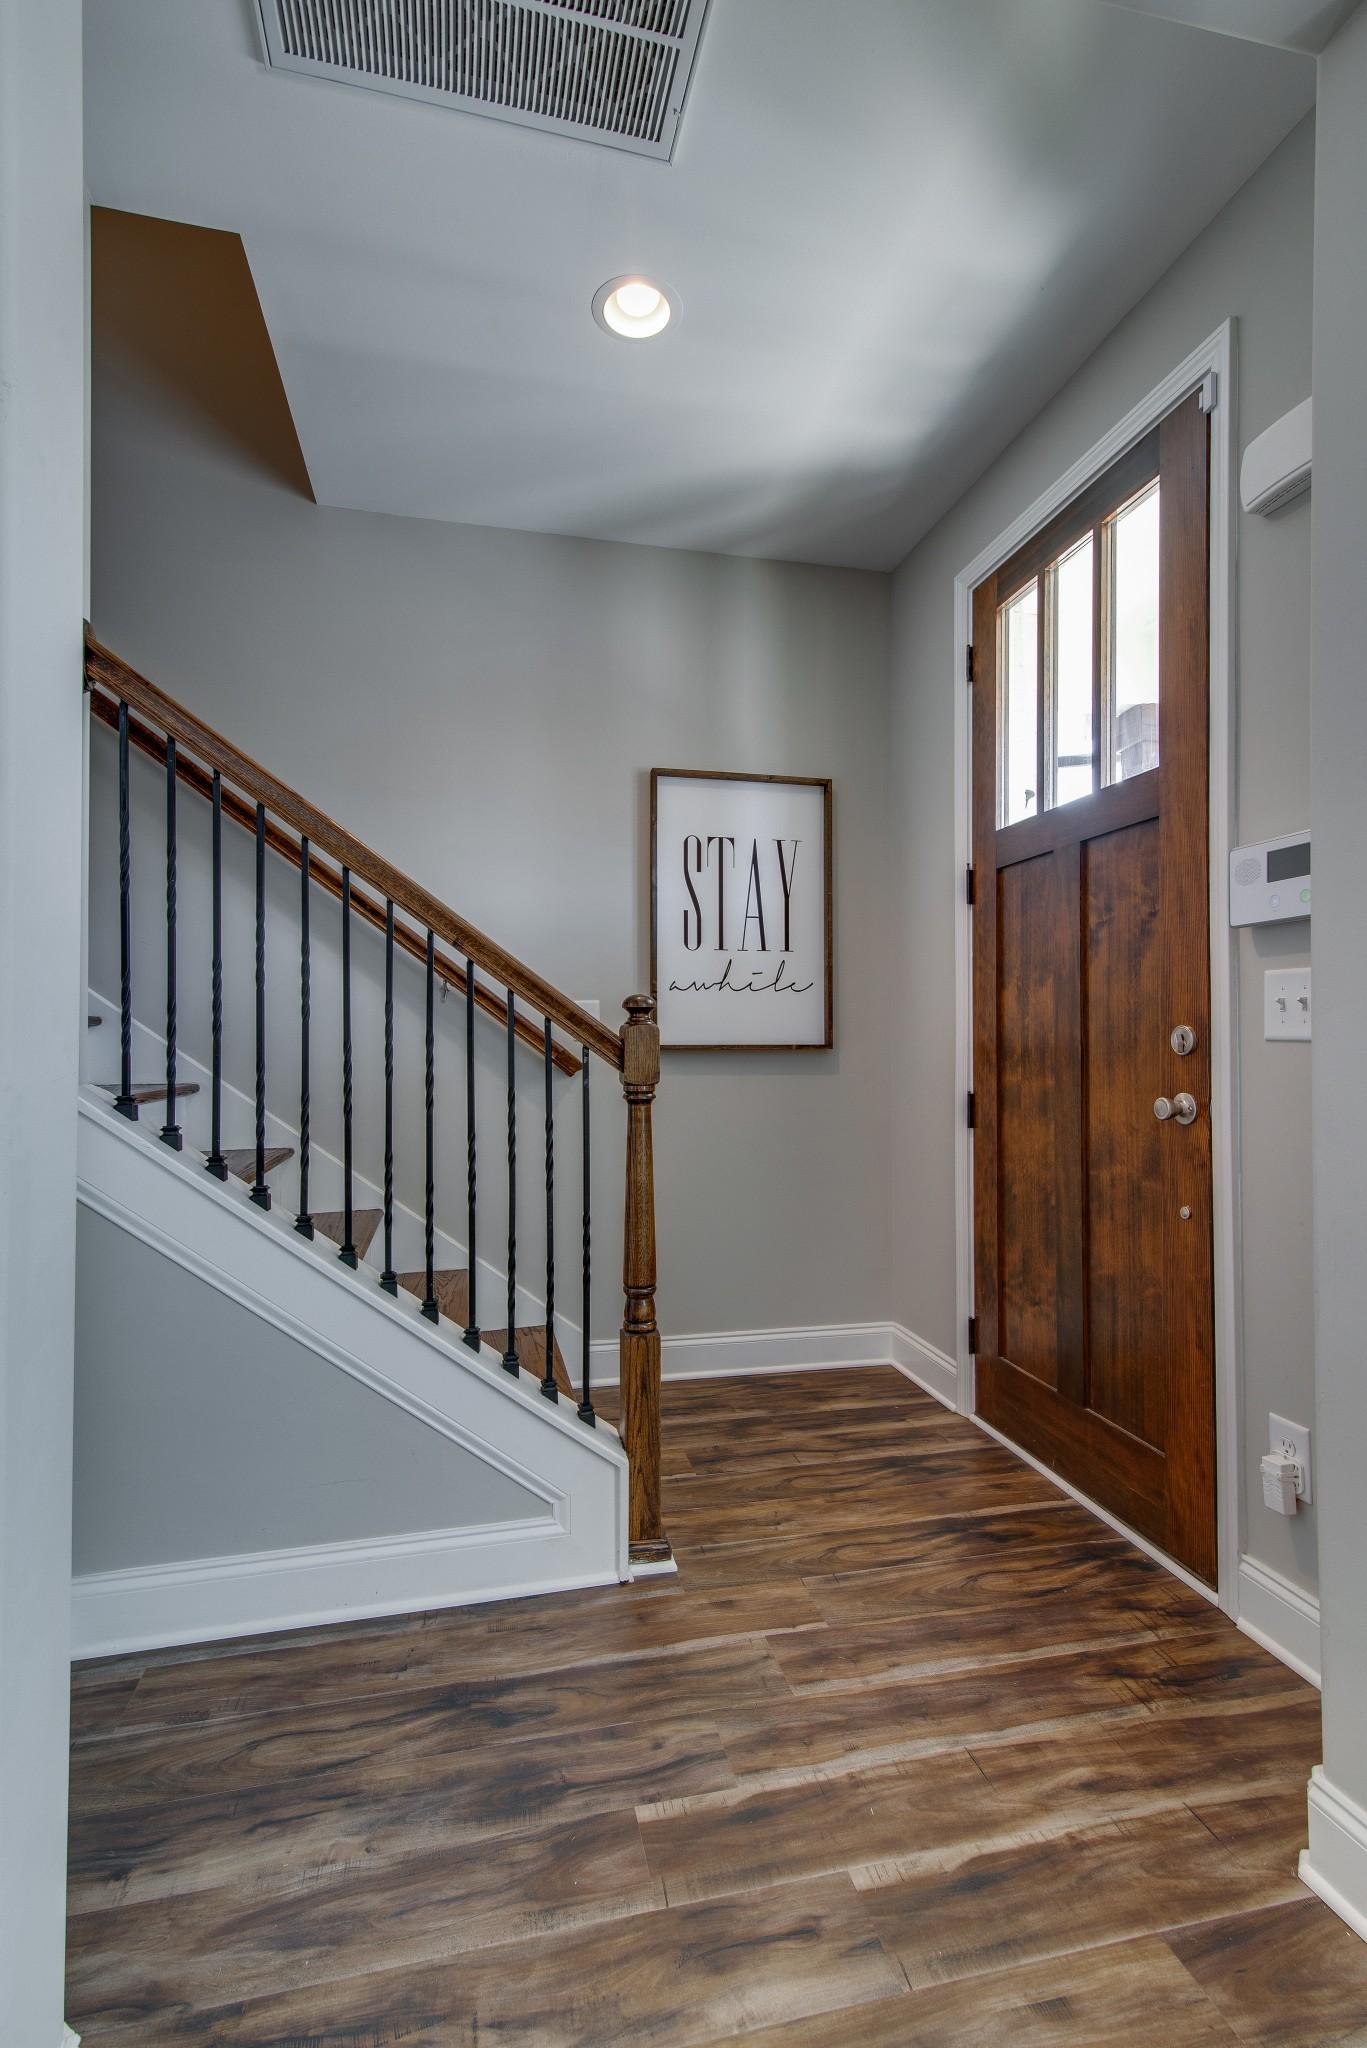 730 Old Hickory Blvd, Nashville, TN 37209 - Nashville, TN real estate listing